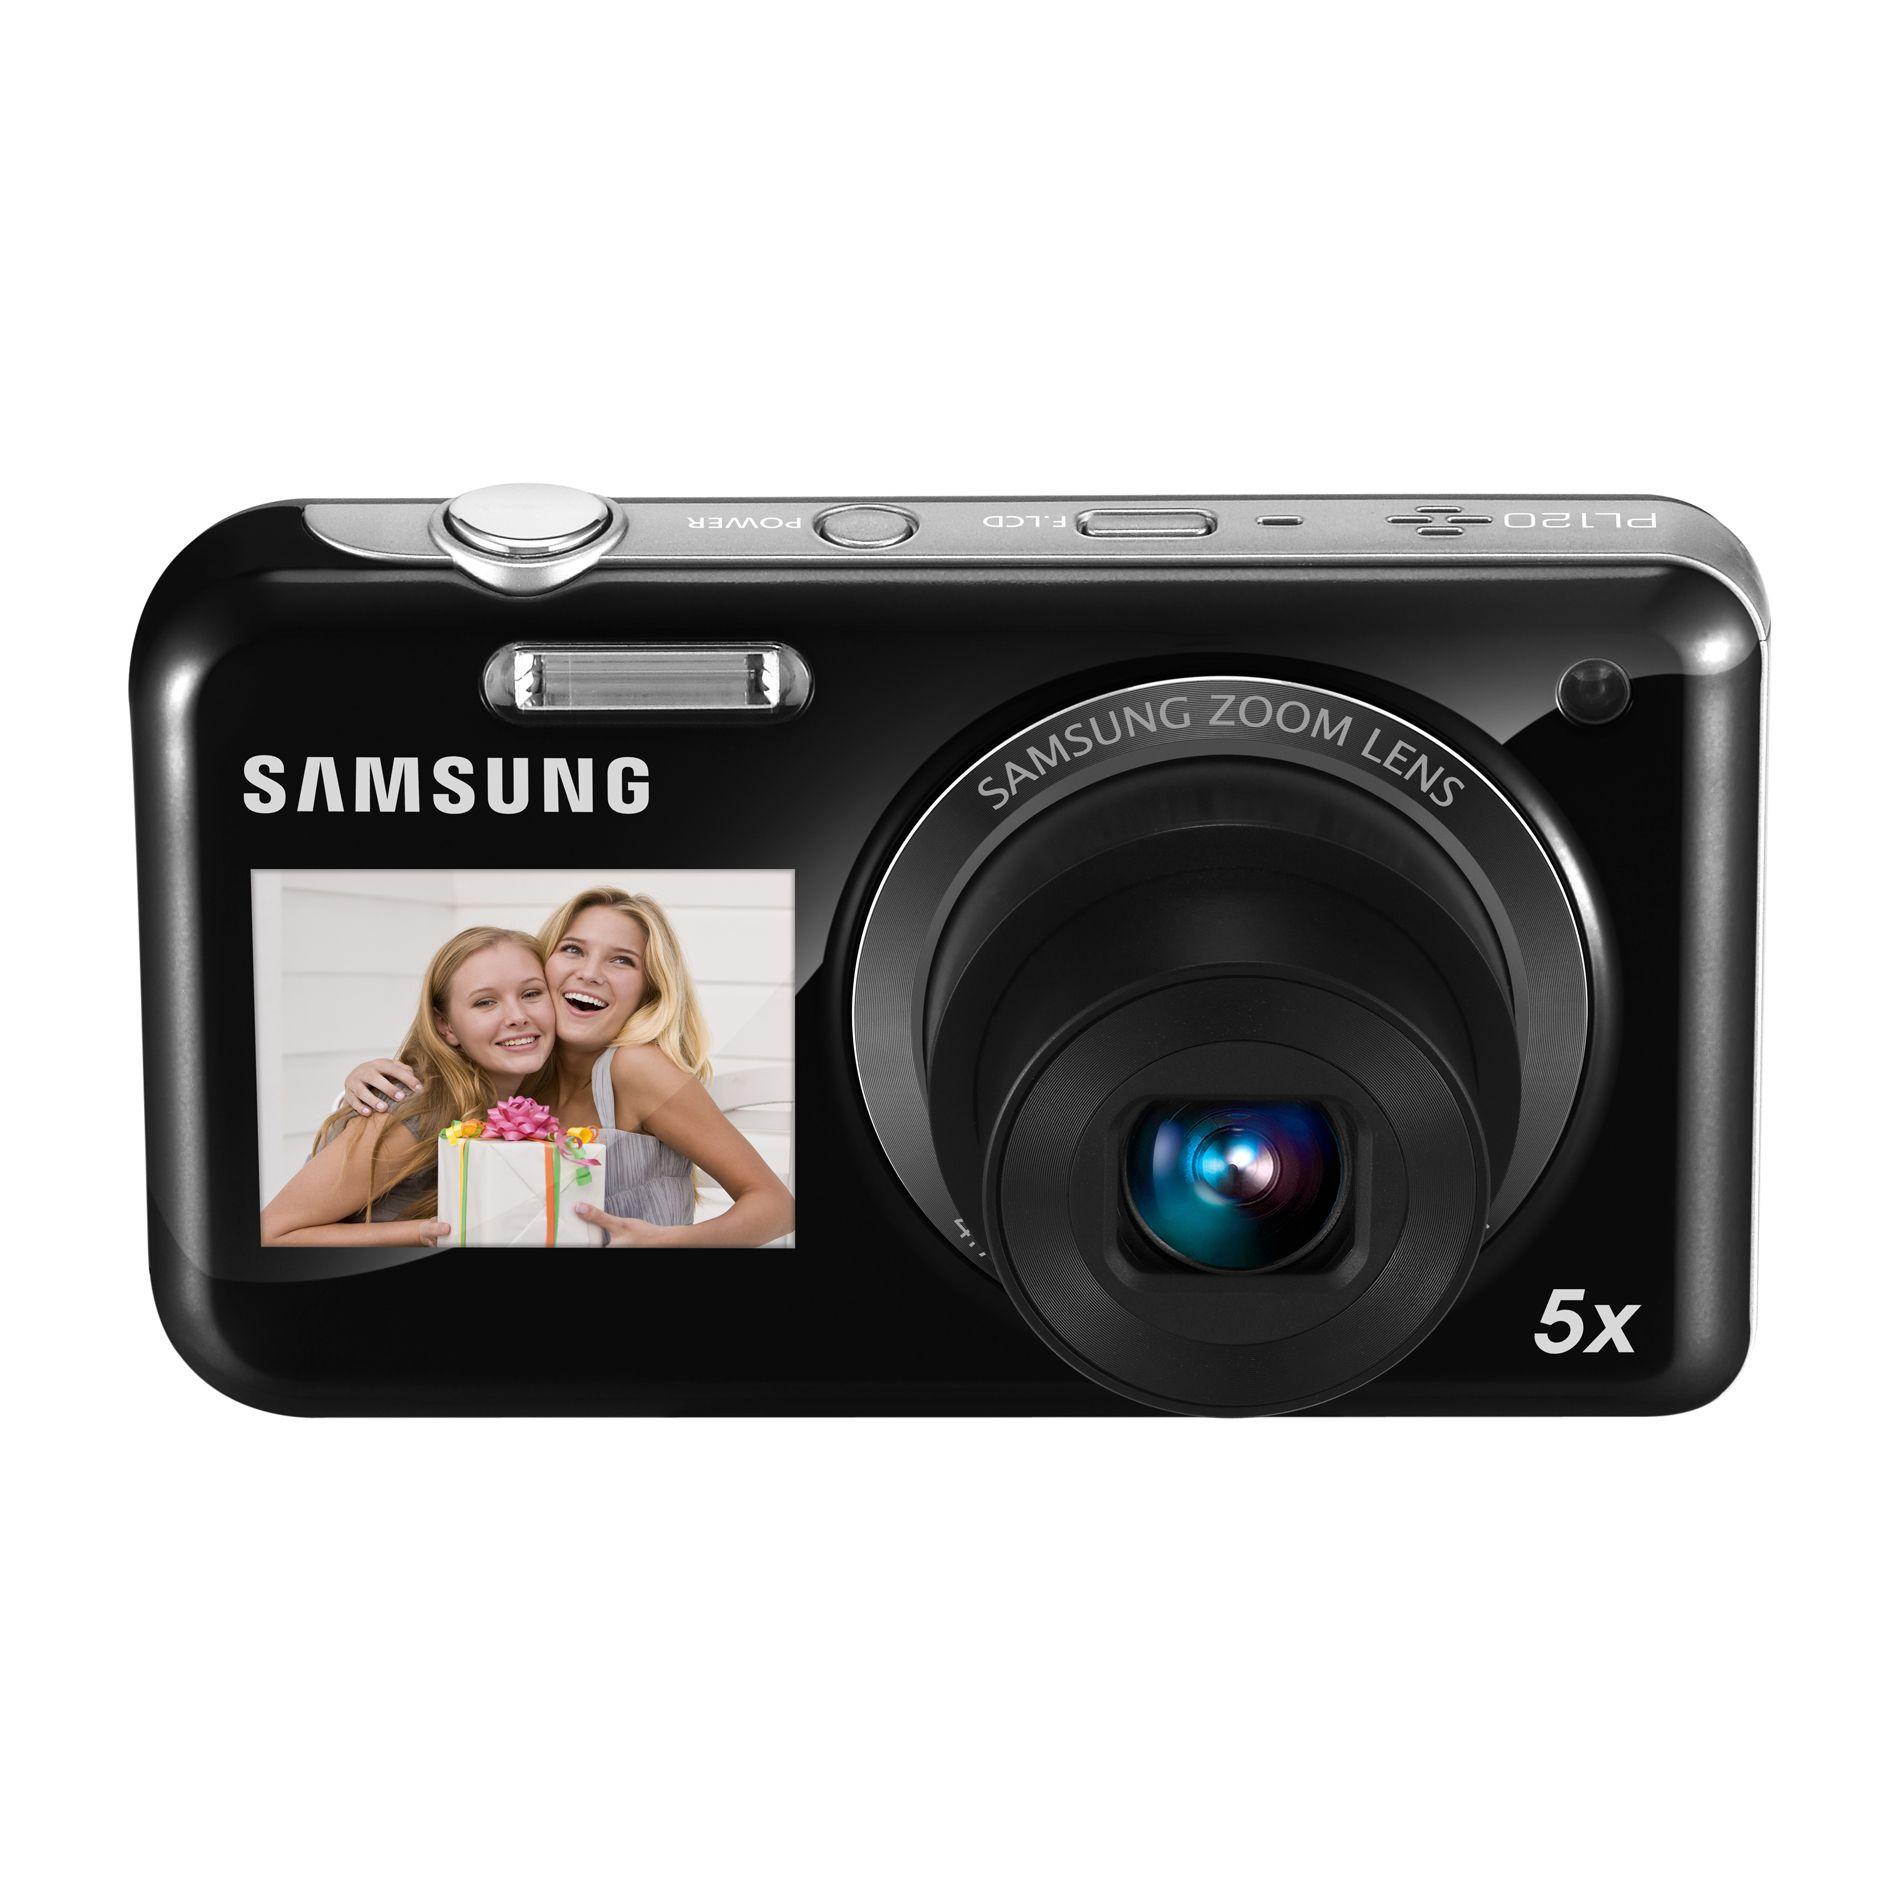 Samsung PL120 DualView 14.2 Megapixel Digital Camera- Black